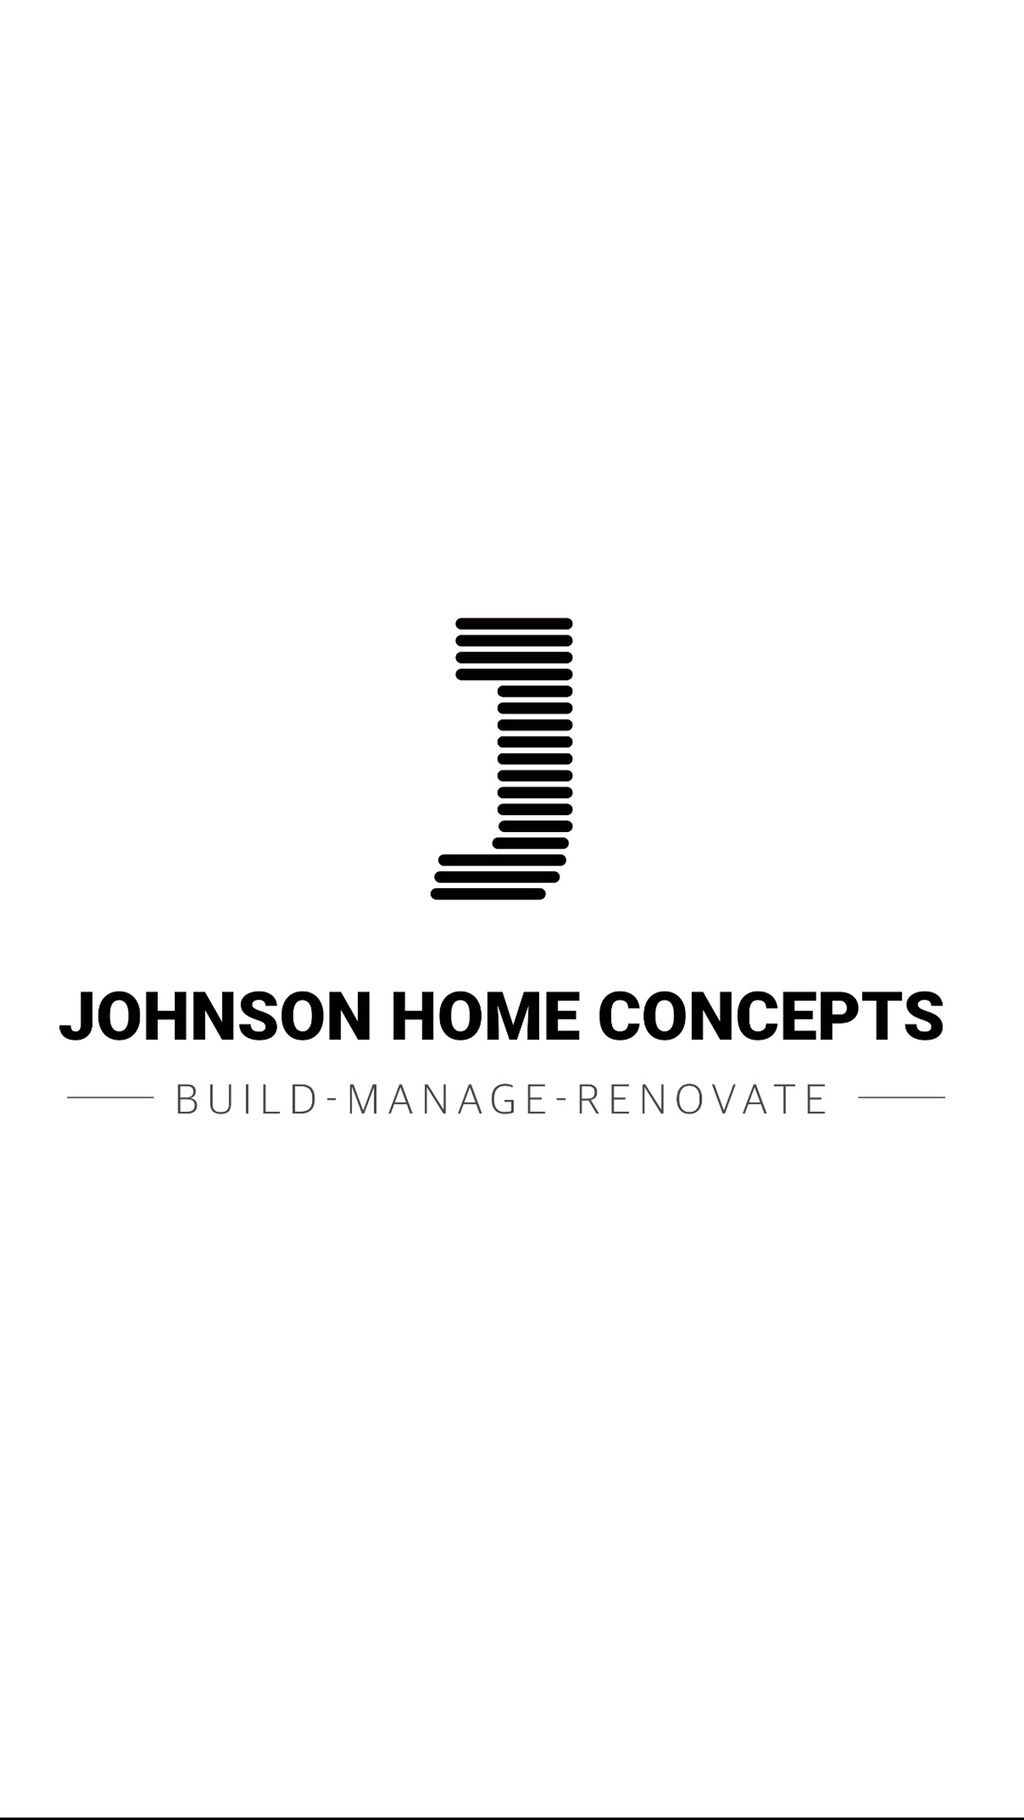 Johnson Home Concepts